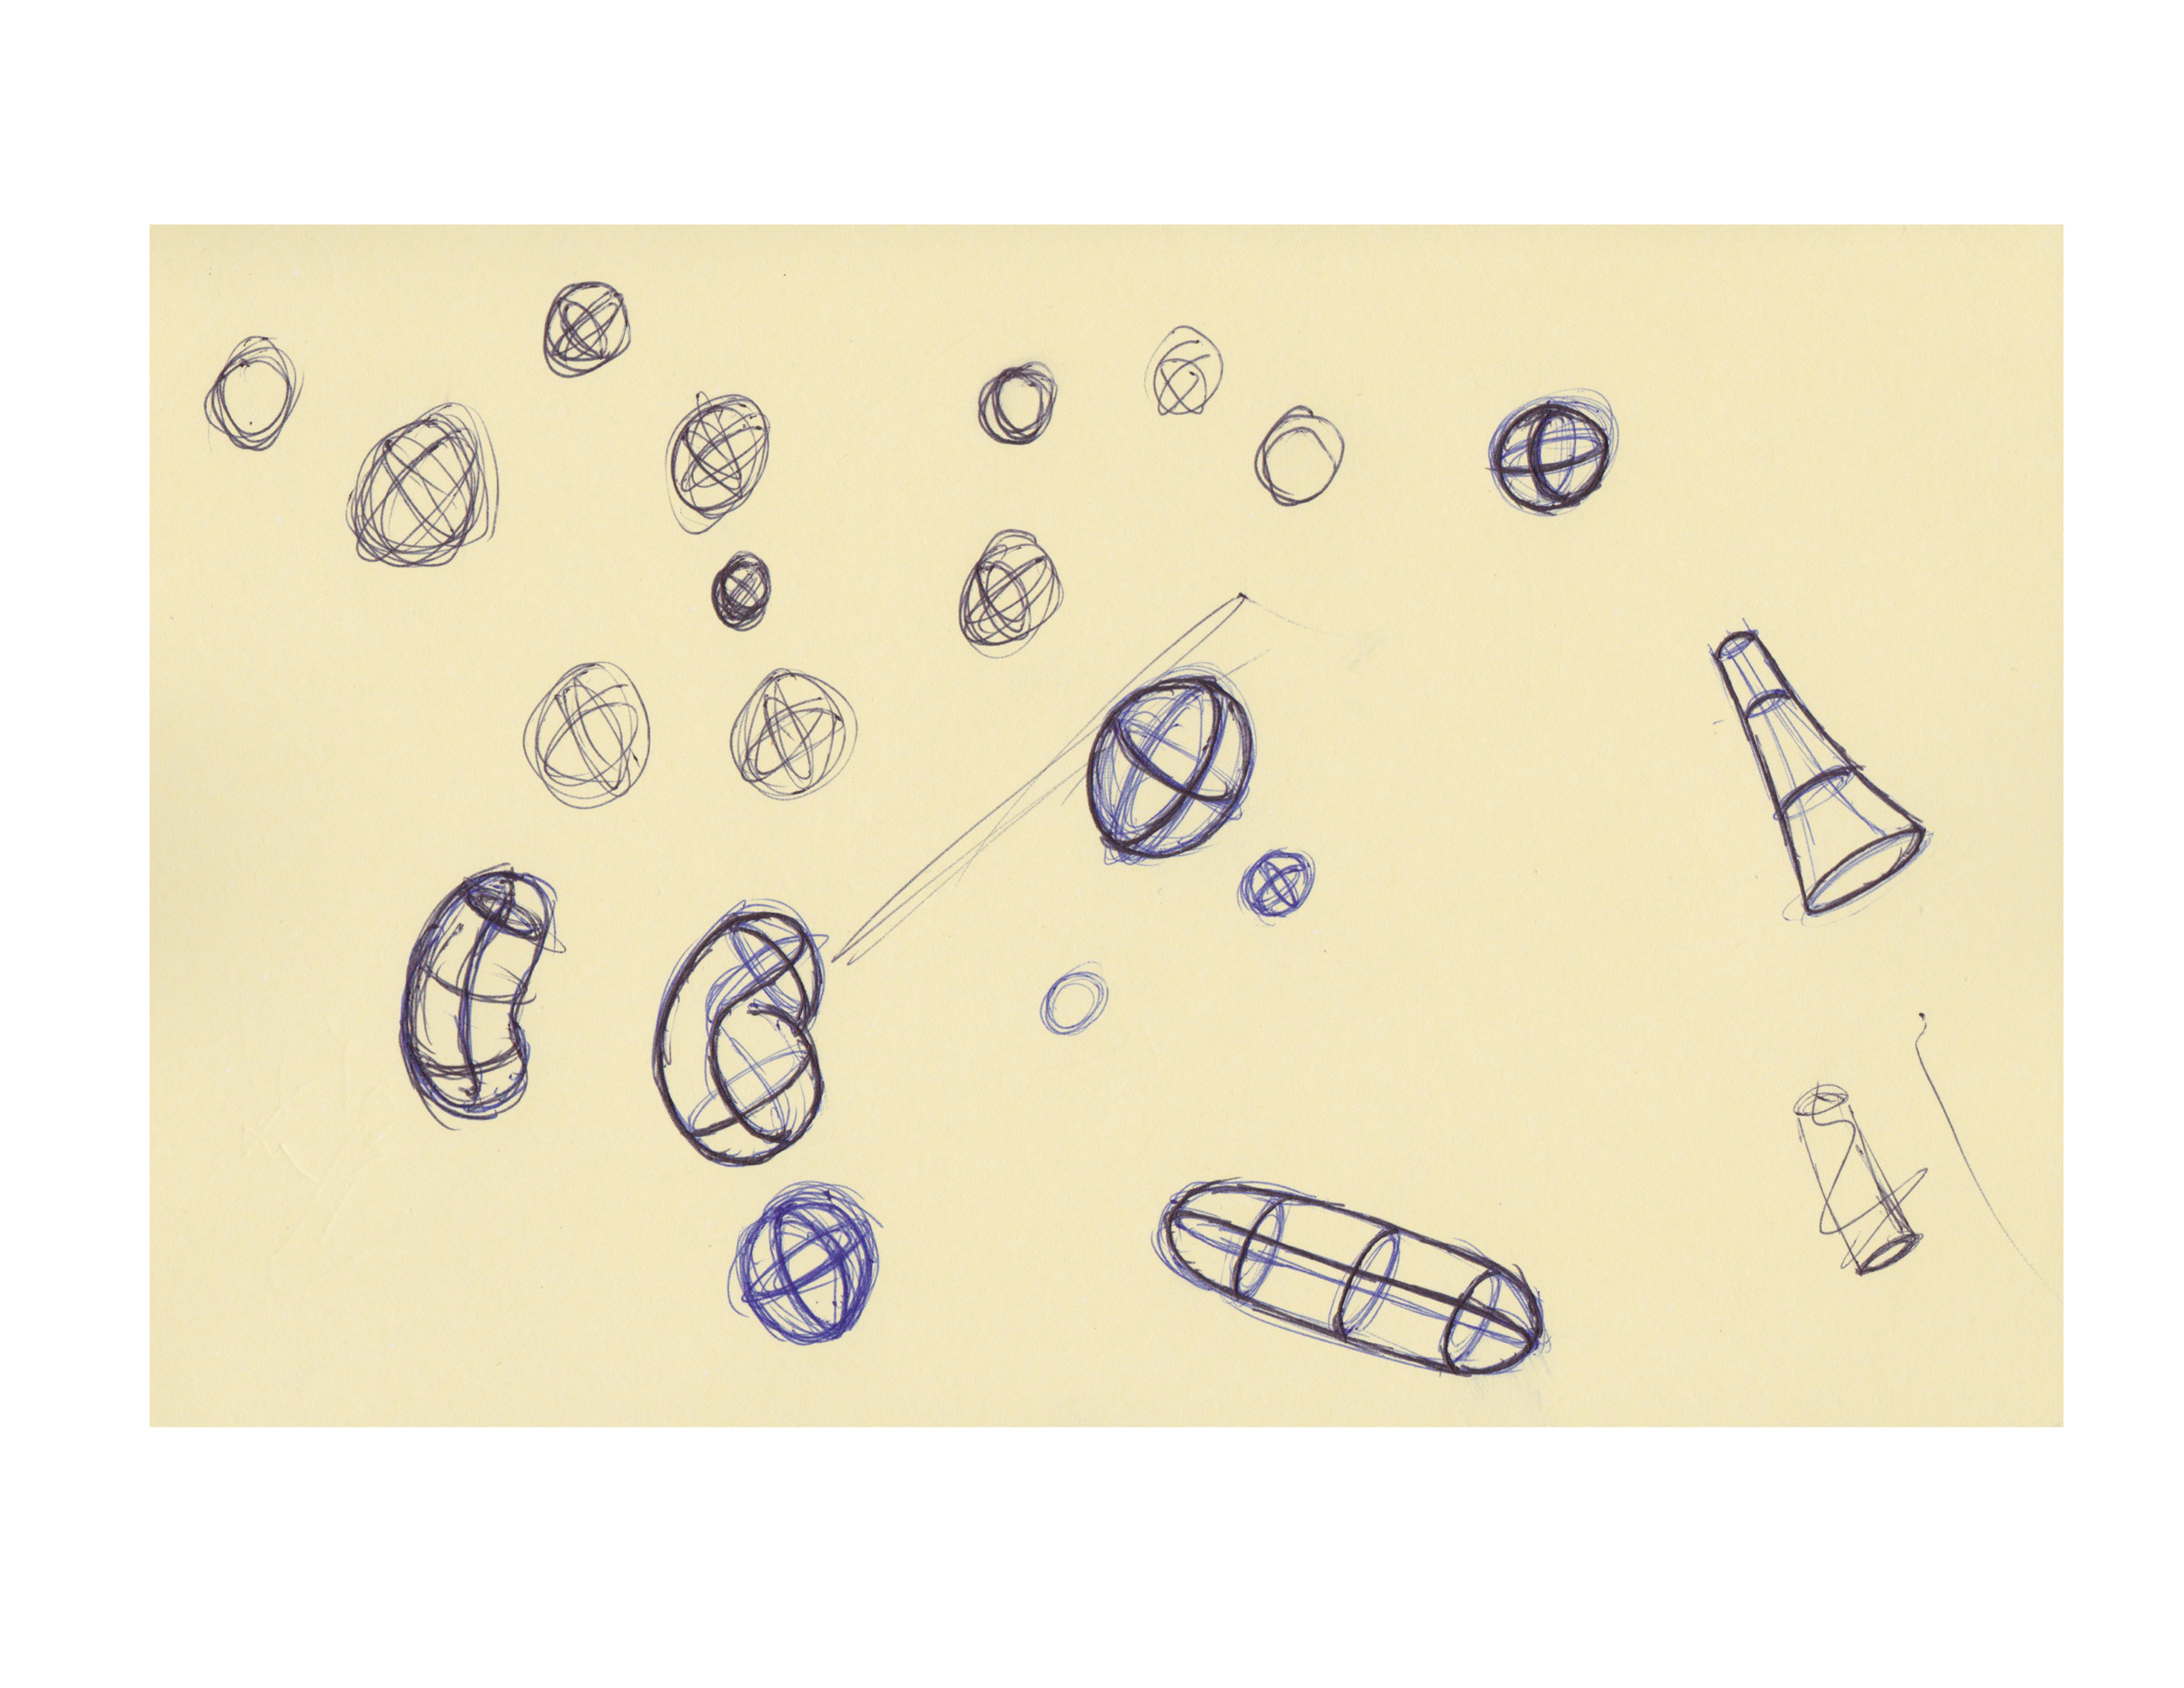 Some shape doodles.